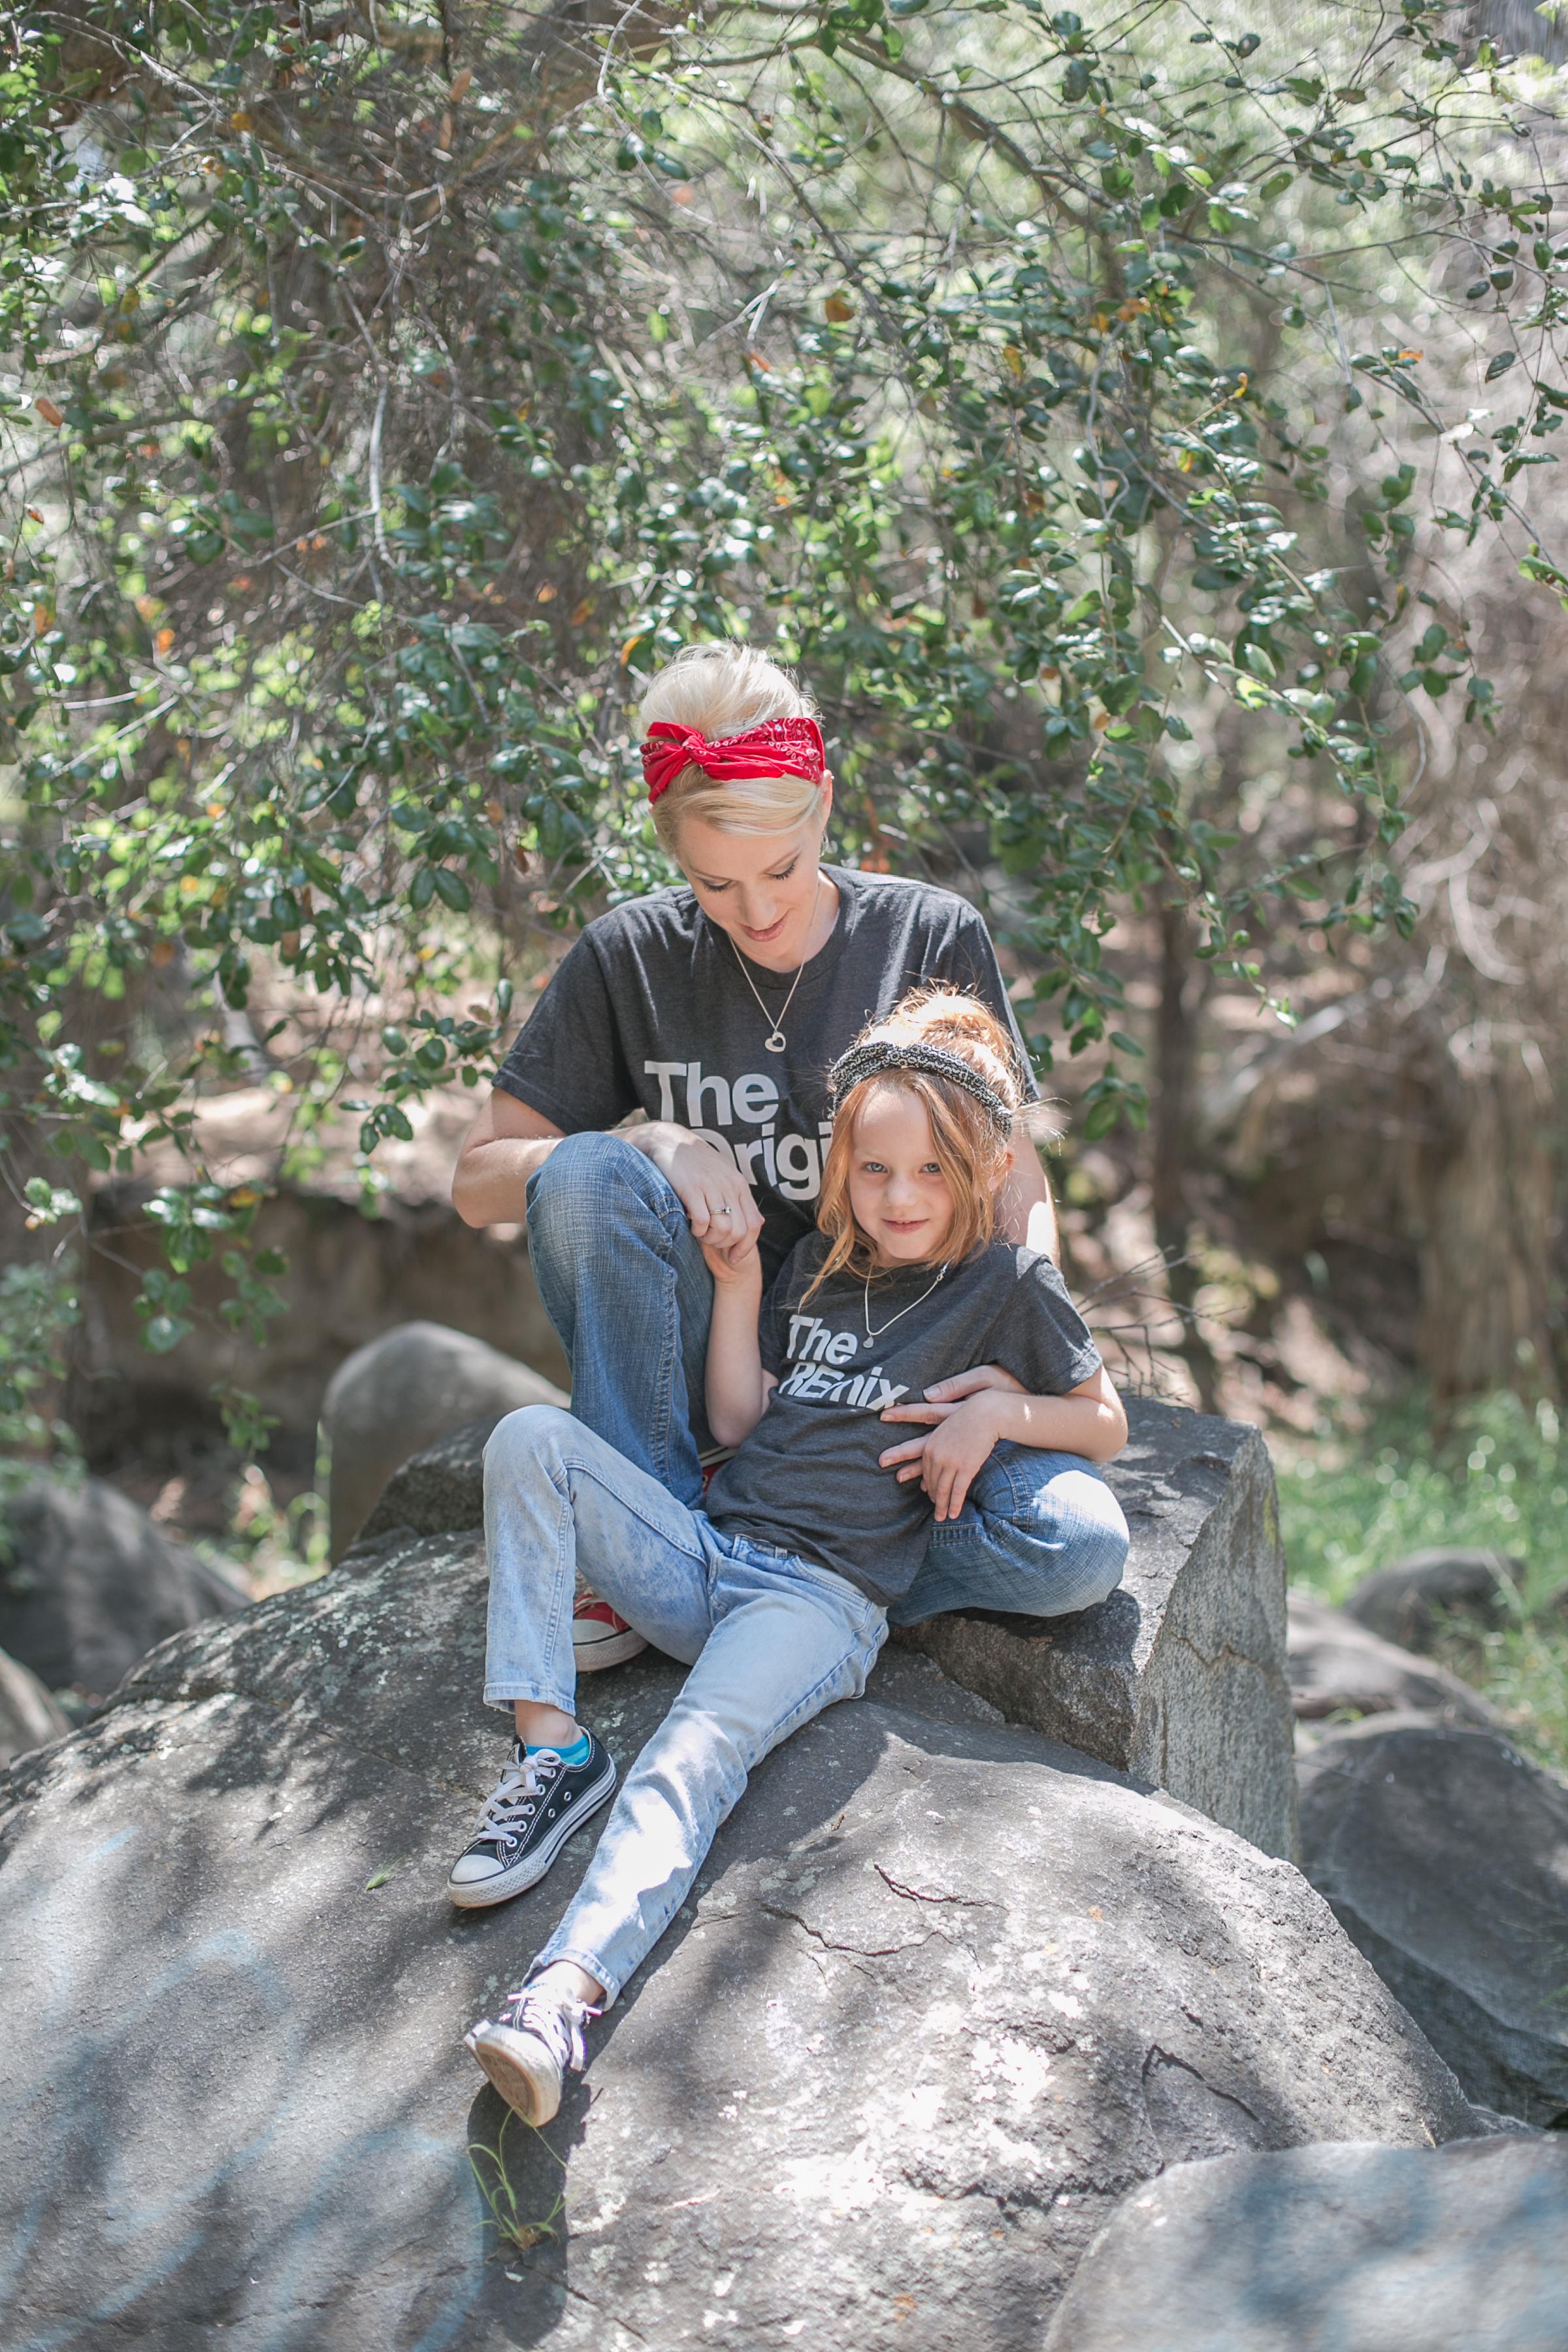 Great_Woodland_Photography_TheTobins_ Felicita Park_Escondido_Family_Session-13.jpg